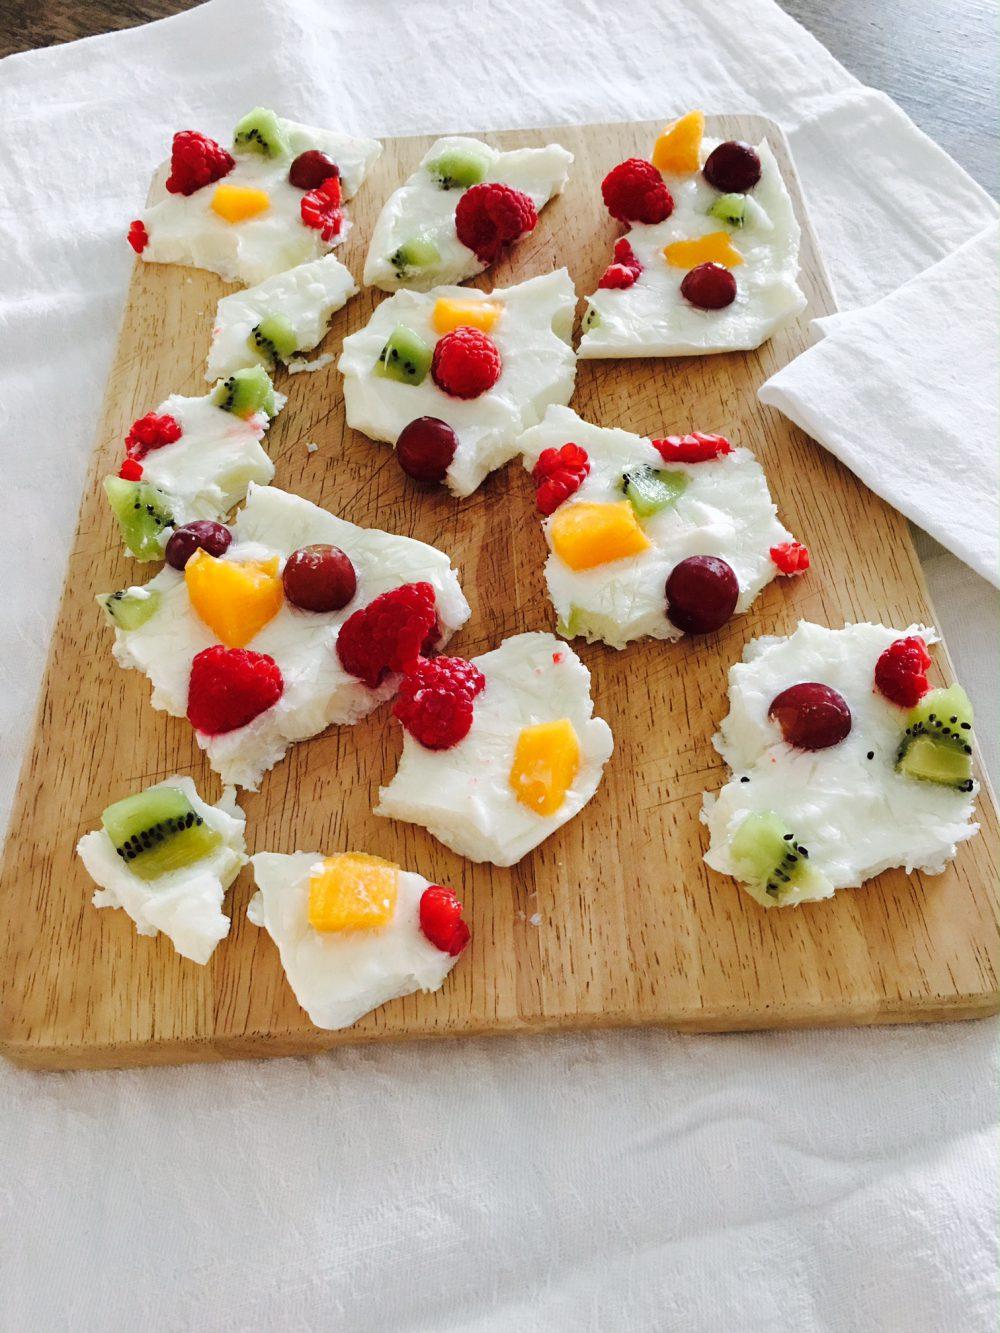 fourhangauf-Joghurt-textbild